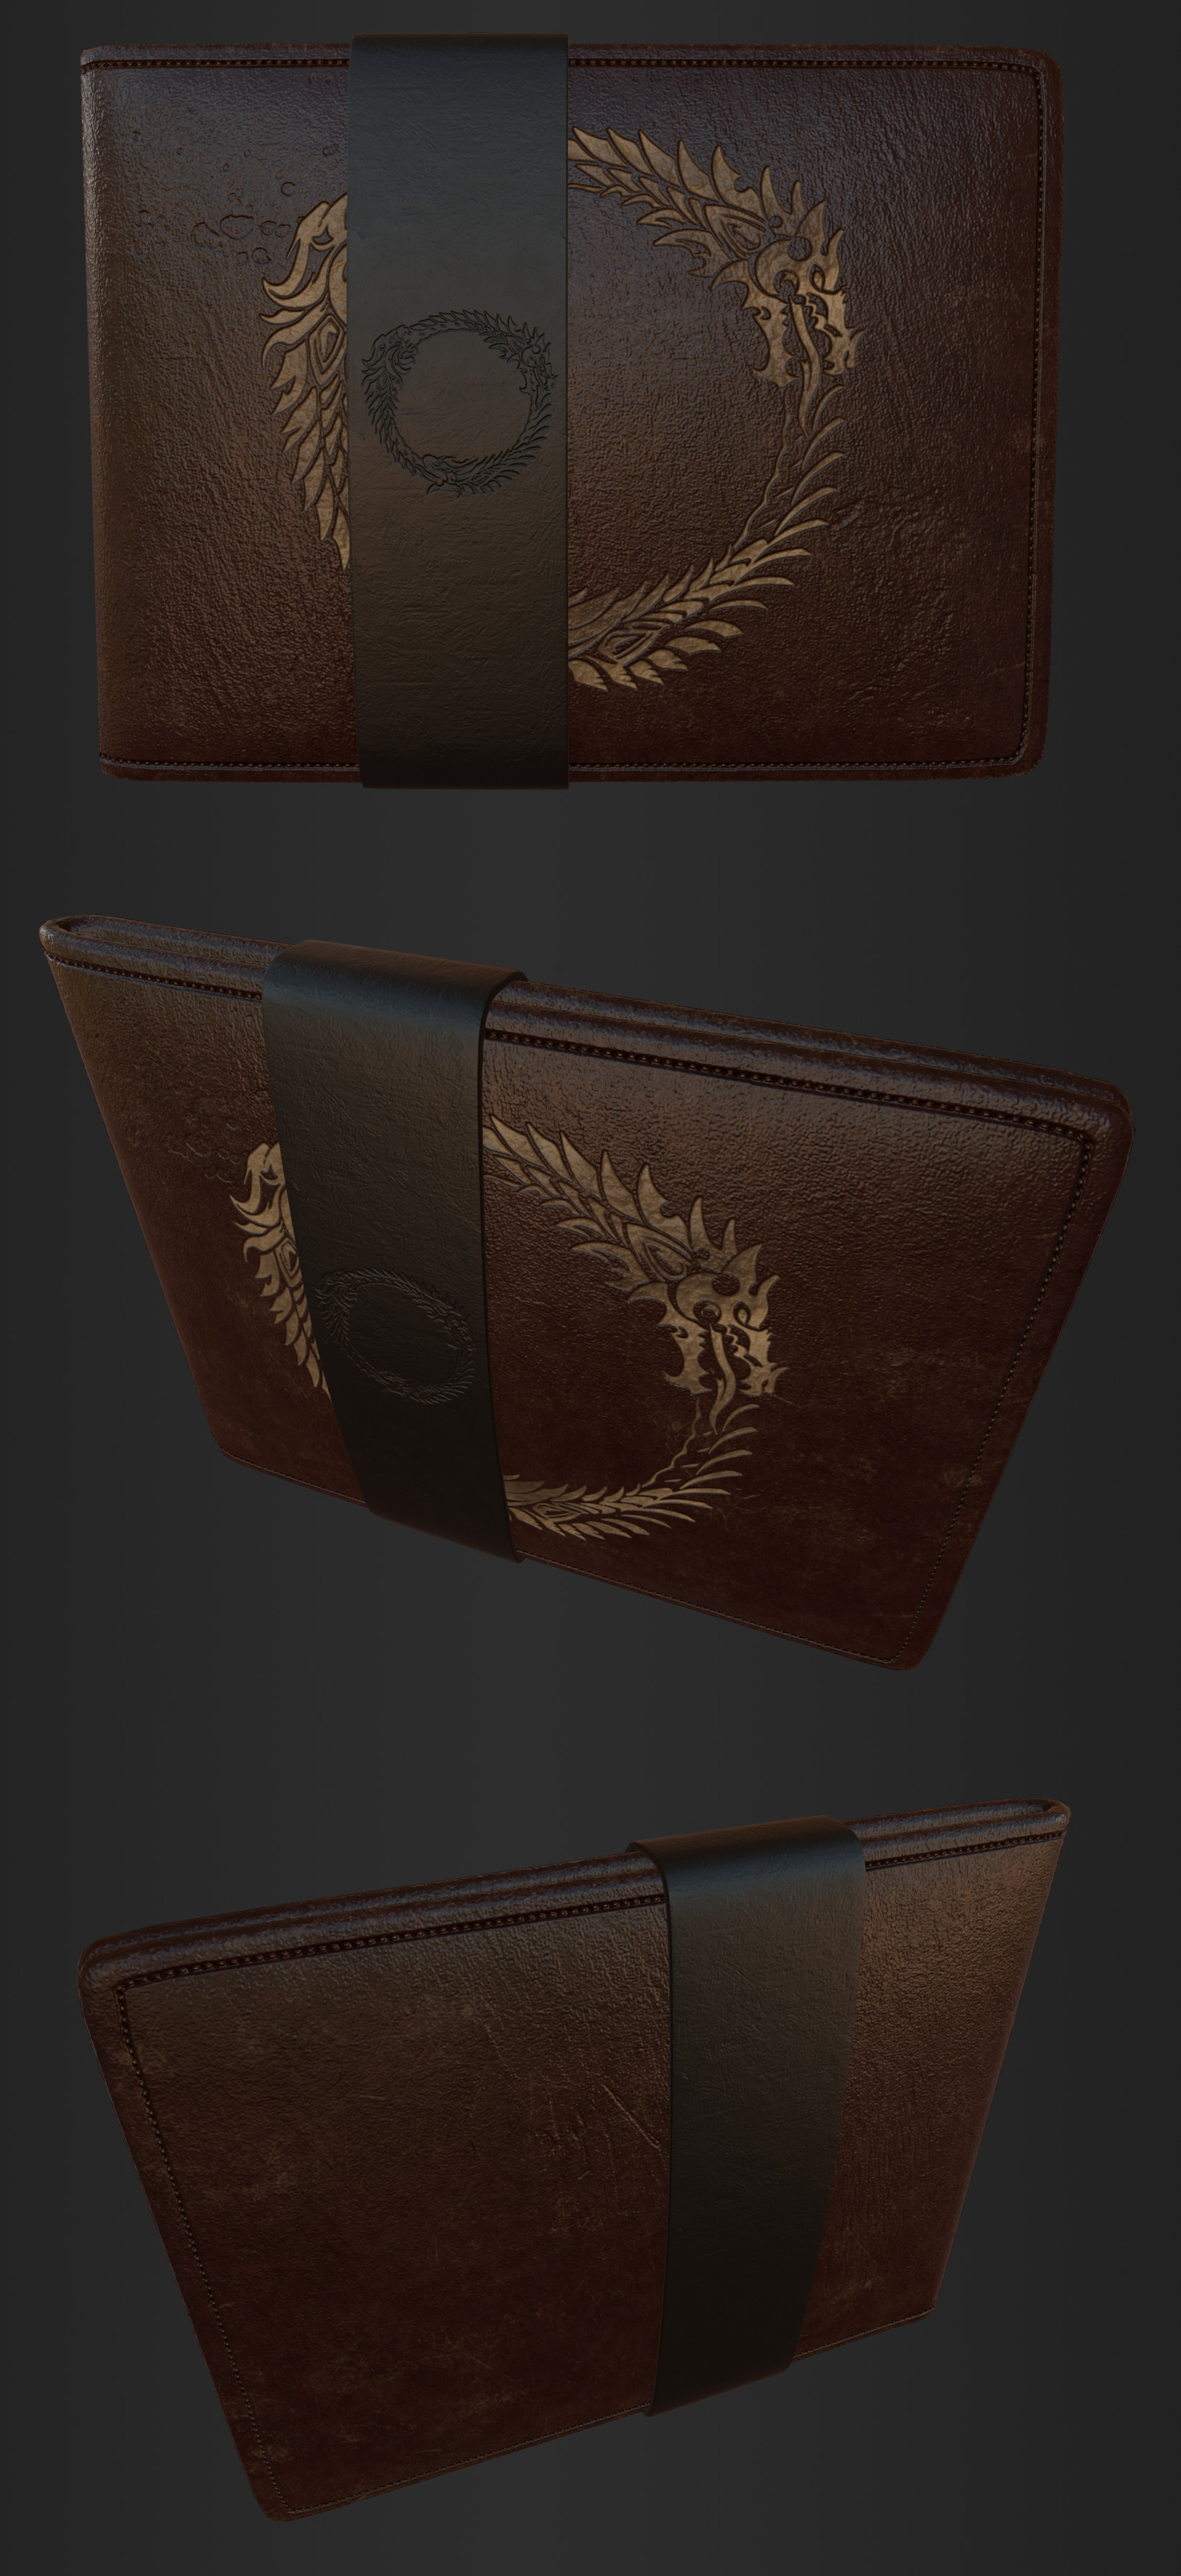 ArtStation - Wallet - The Elder Scrolls Online, Rémi-Dovick Rivest